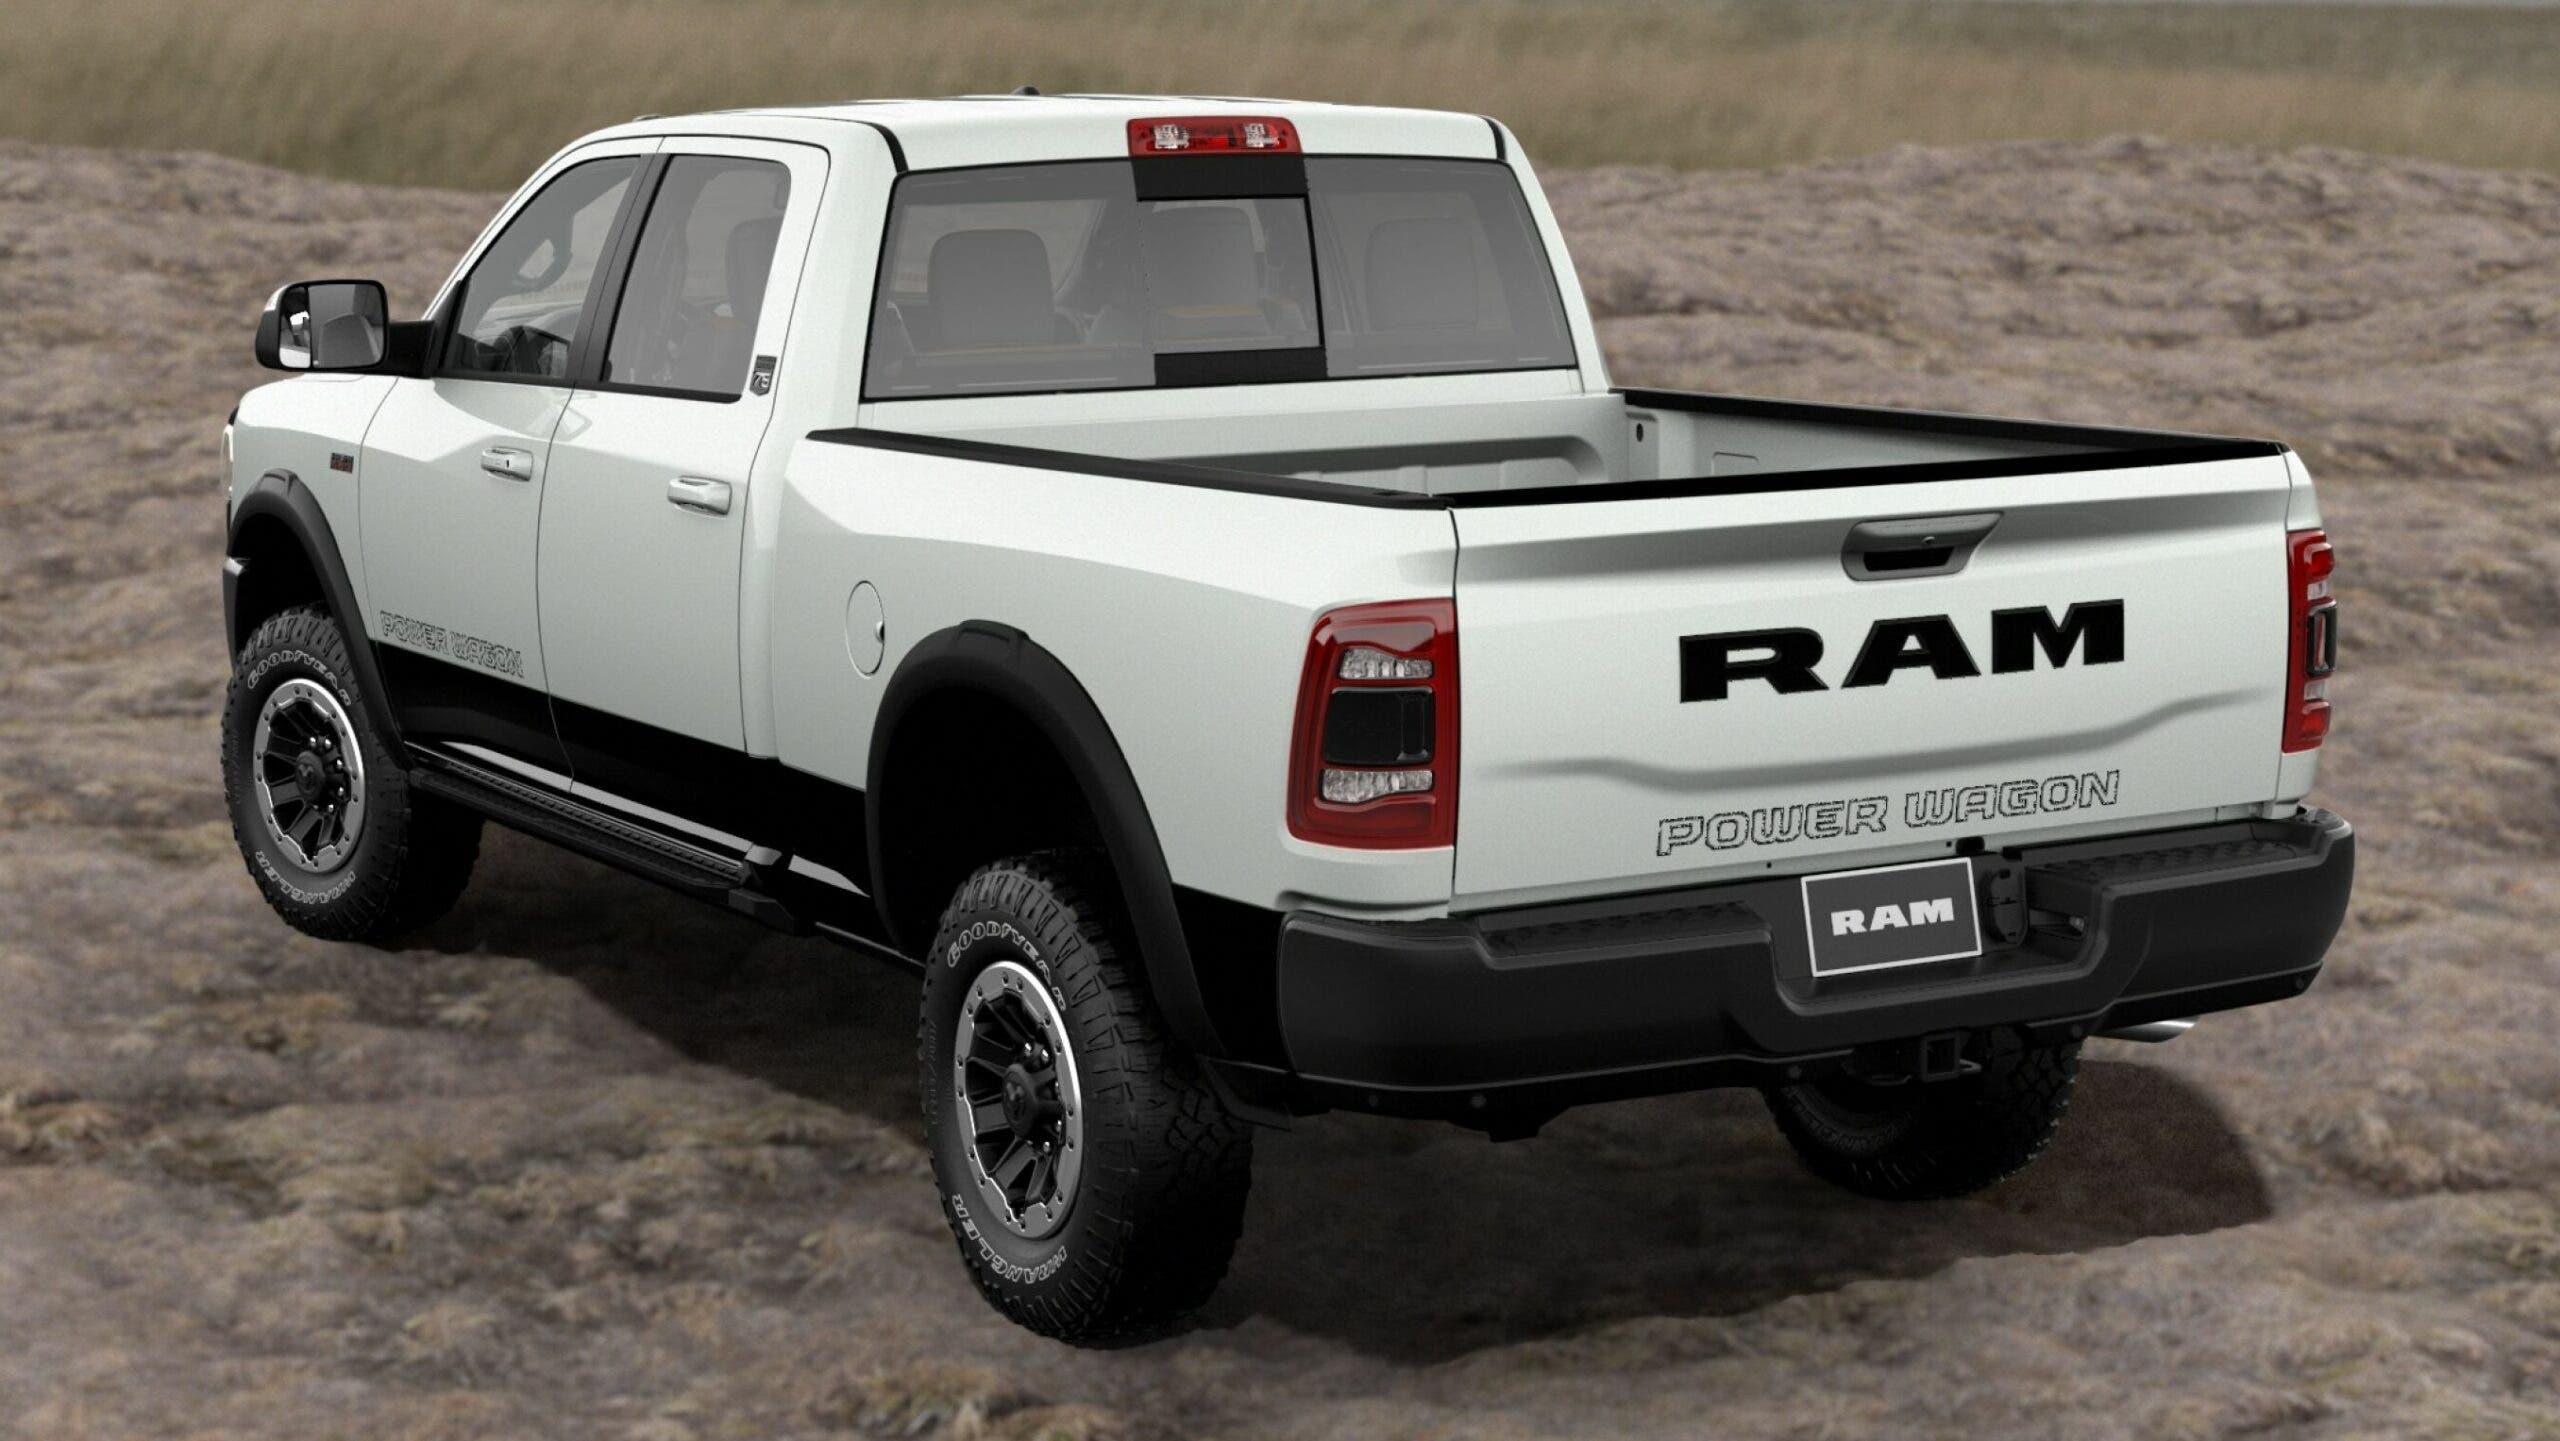 Ram 2500 Power Wagon 2021